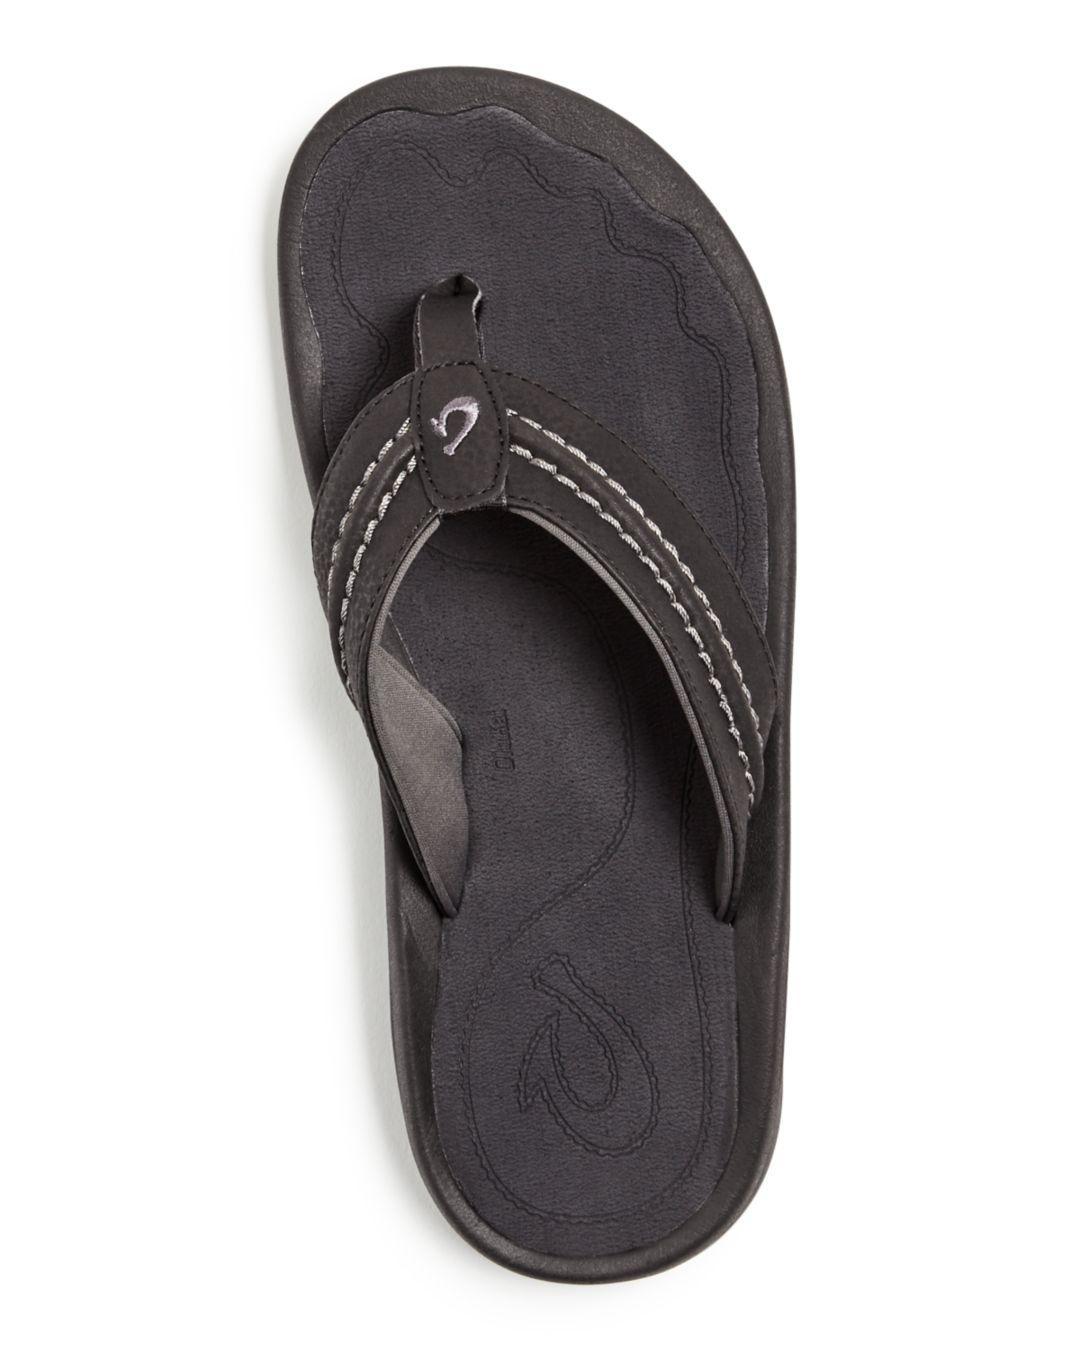 bd61ed11a2dd Lyst - Olukai Men s Hokua Flip-flops in Black for Men